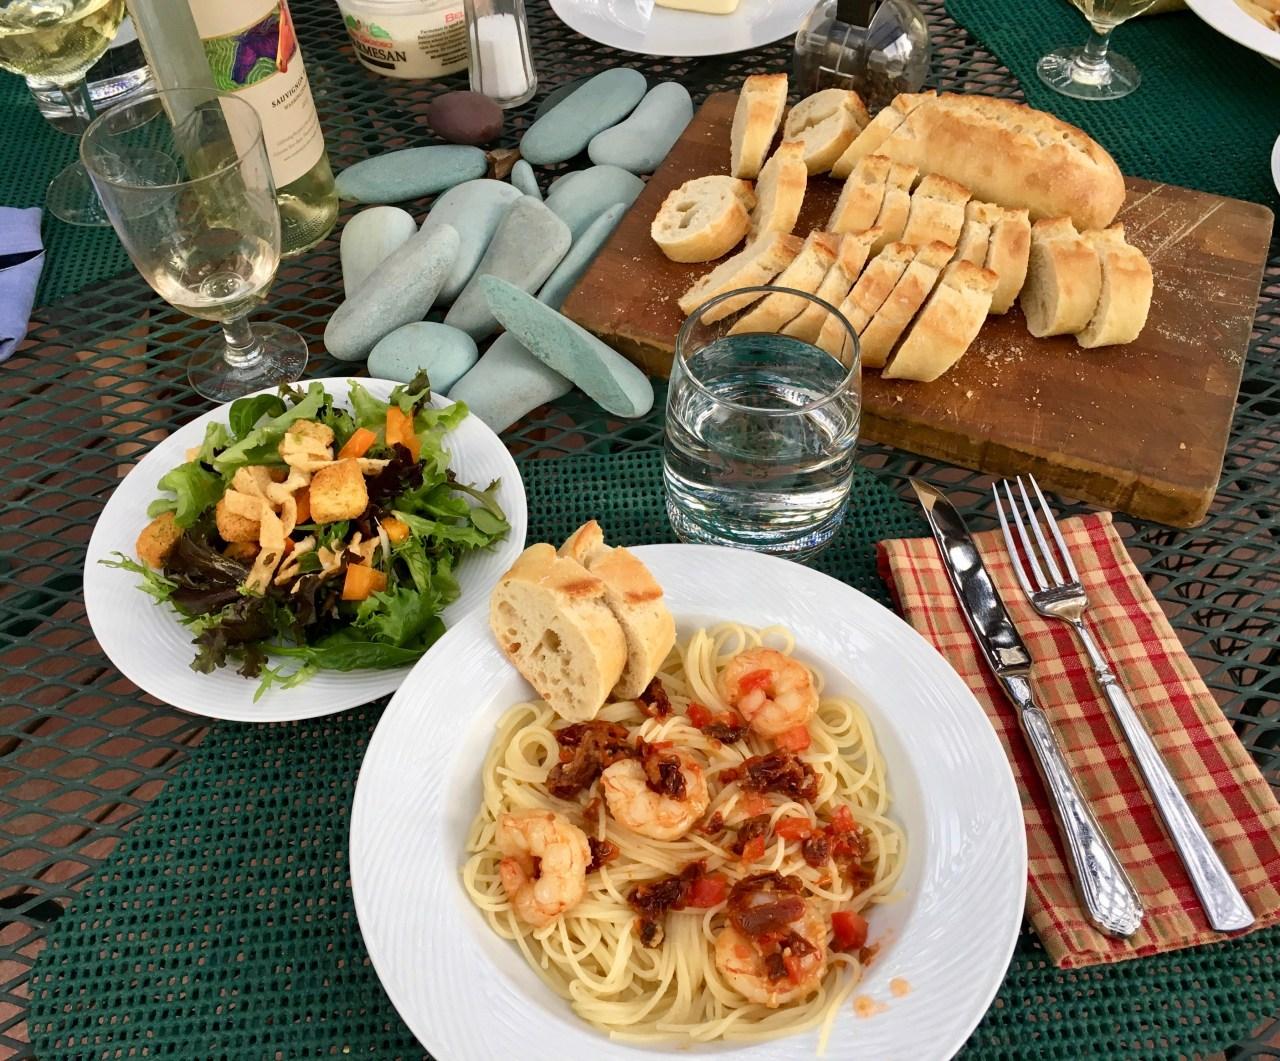 Dinner at Tom and Nancy's House